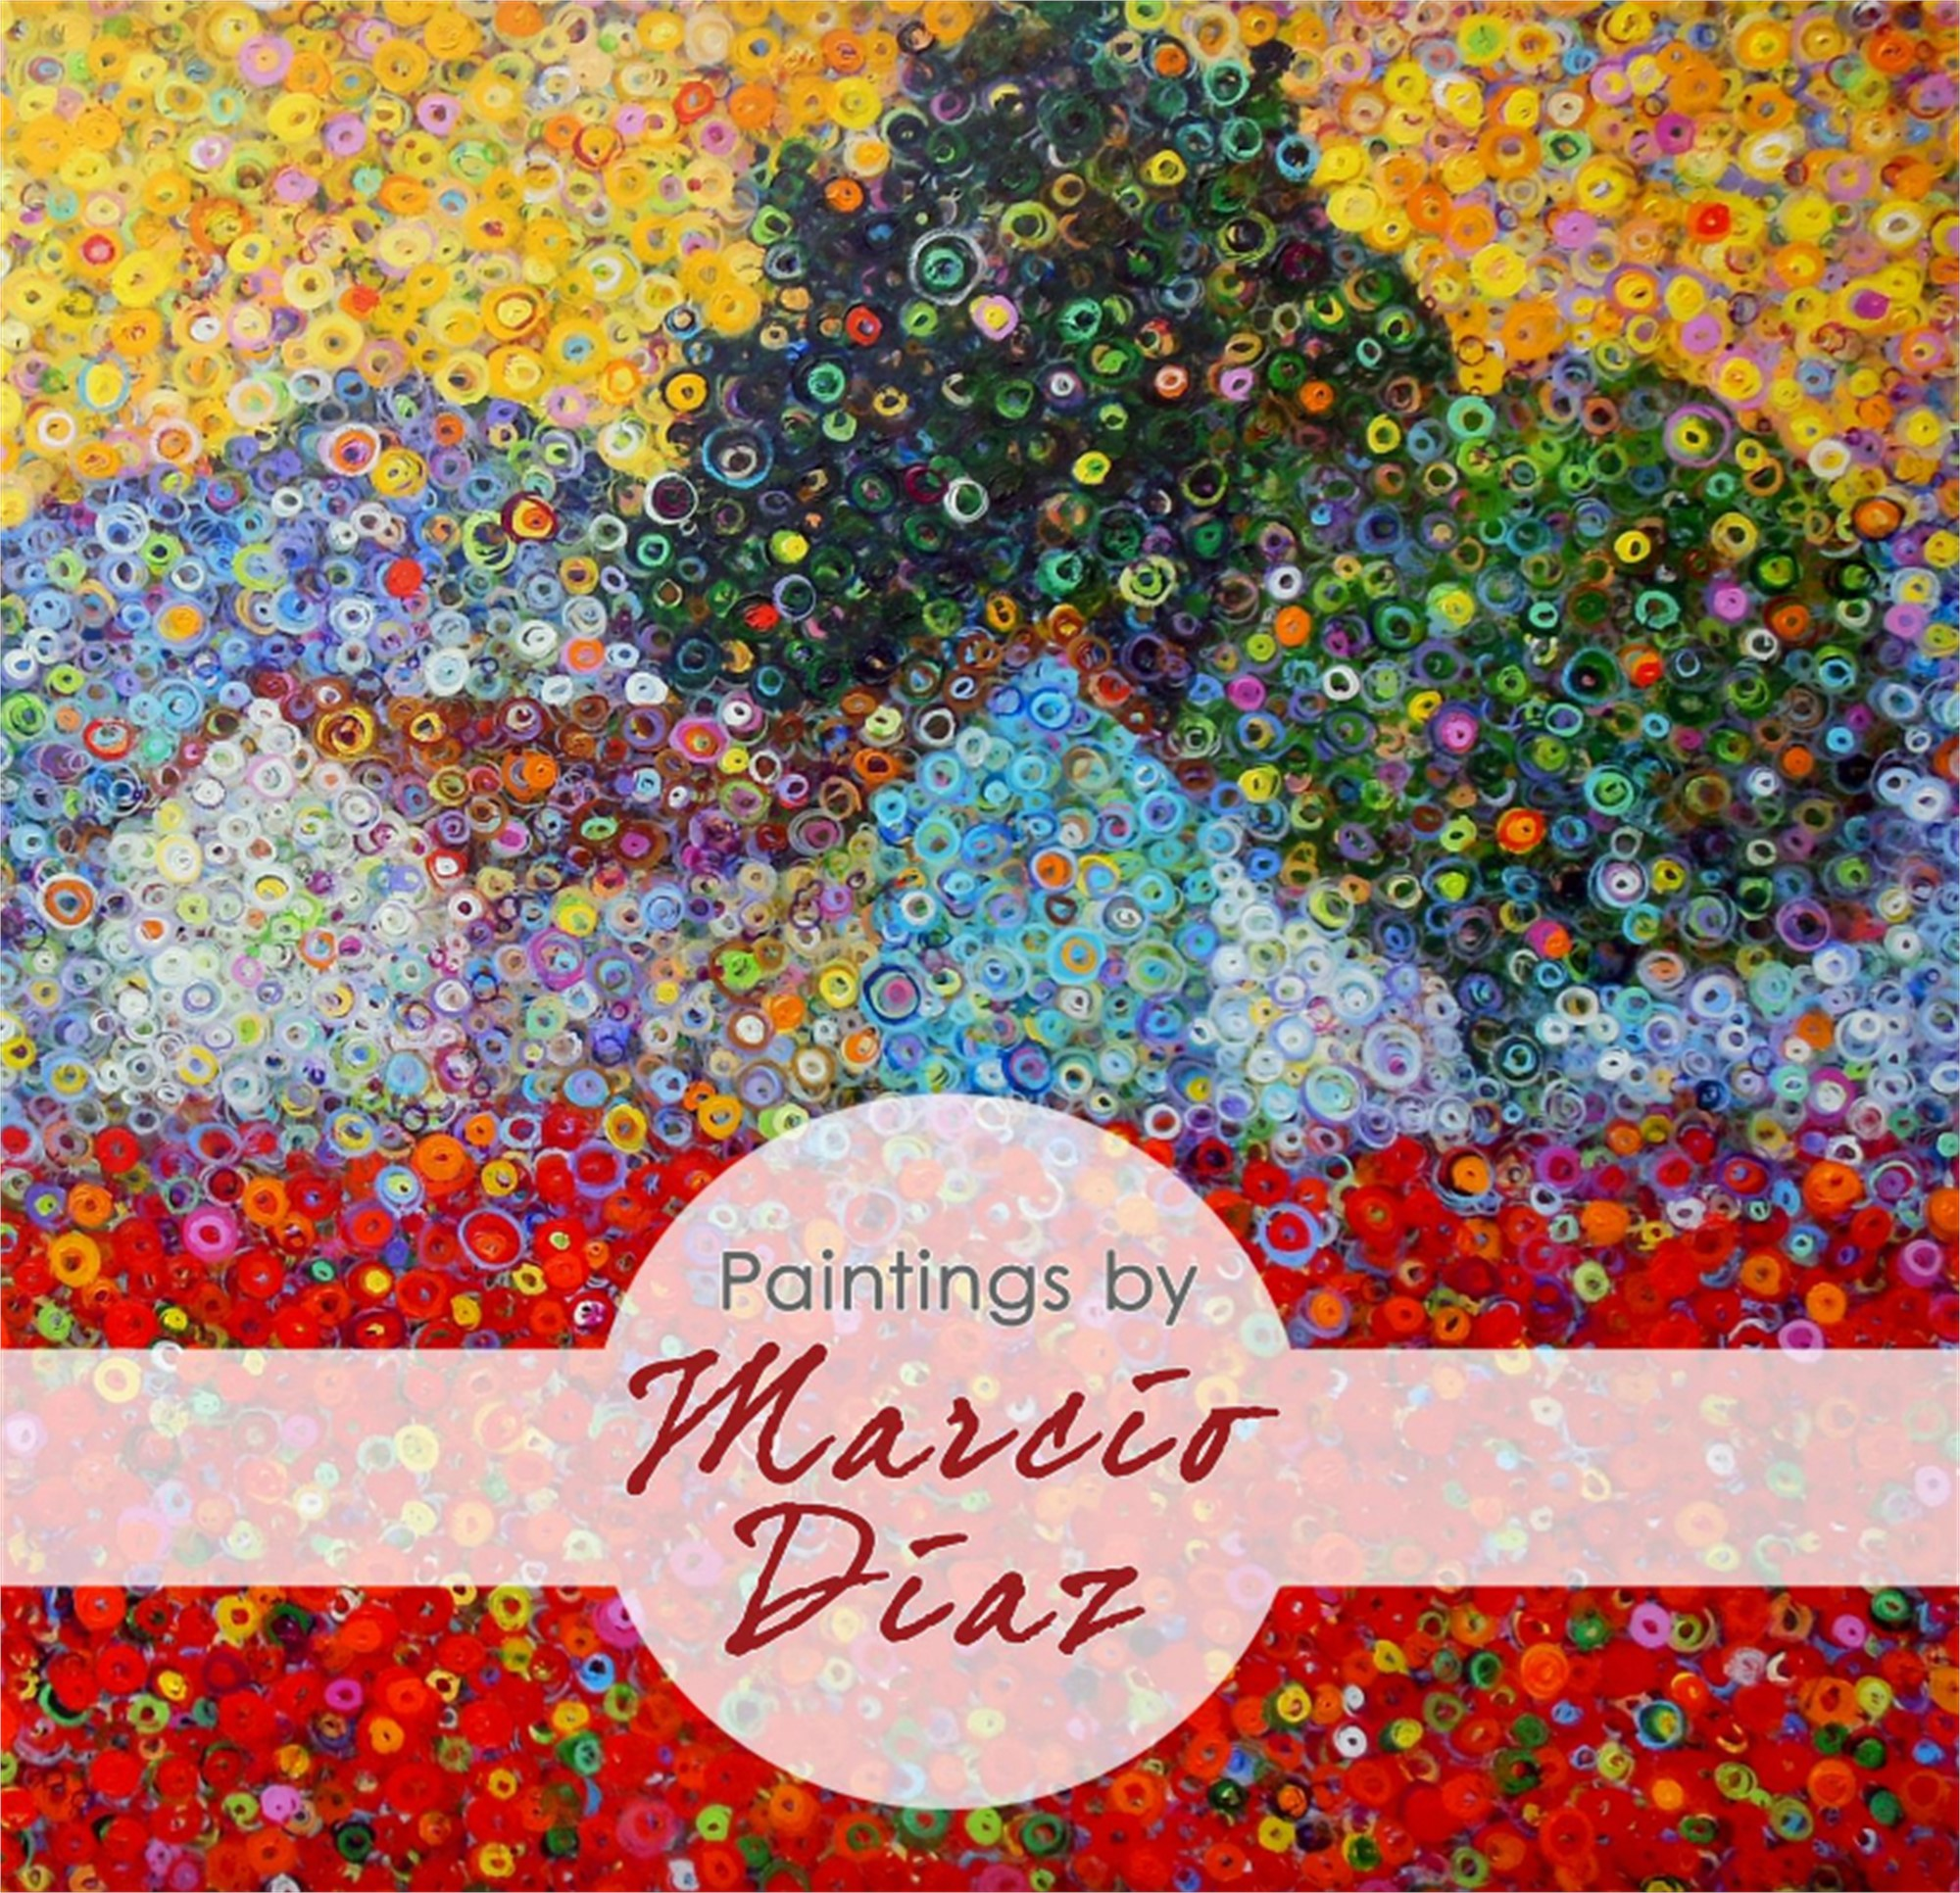 Marcio Diaz: New Works   exhibition catalog by Marcio Diaz